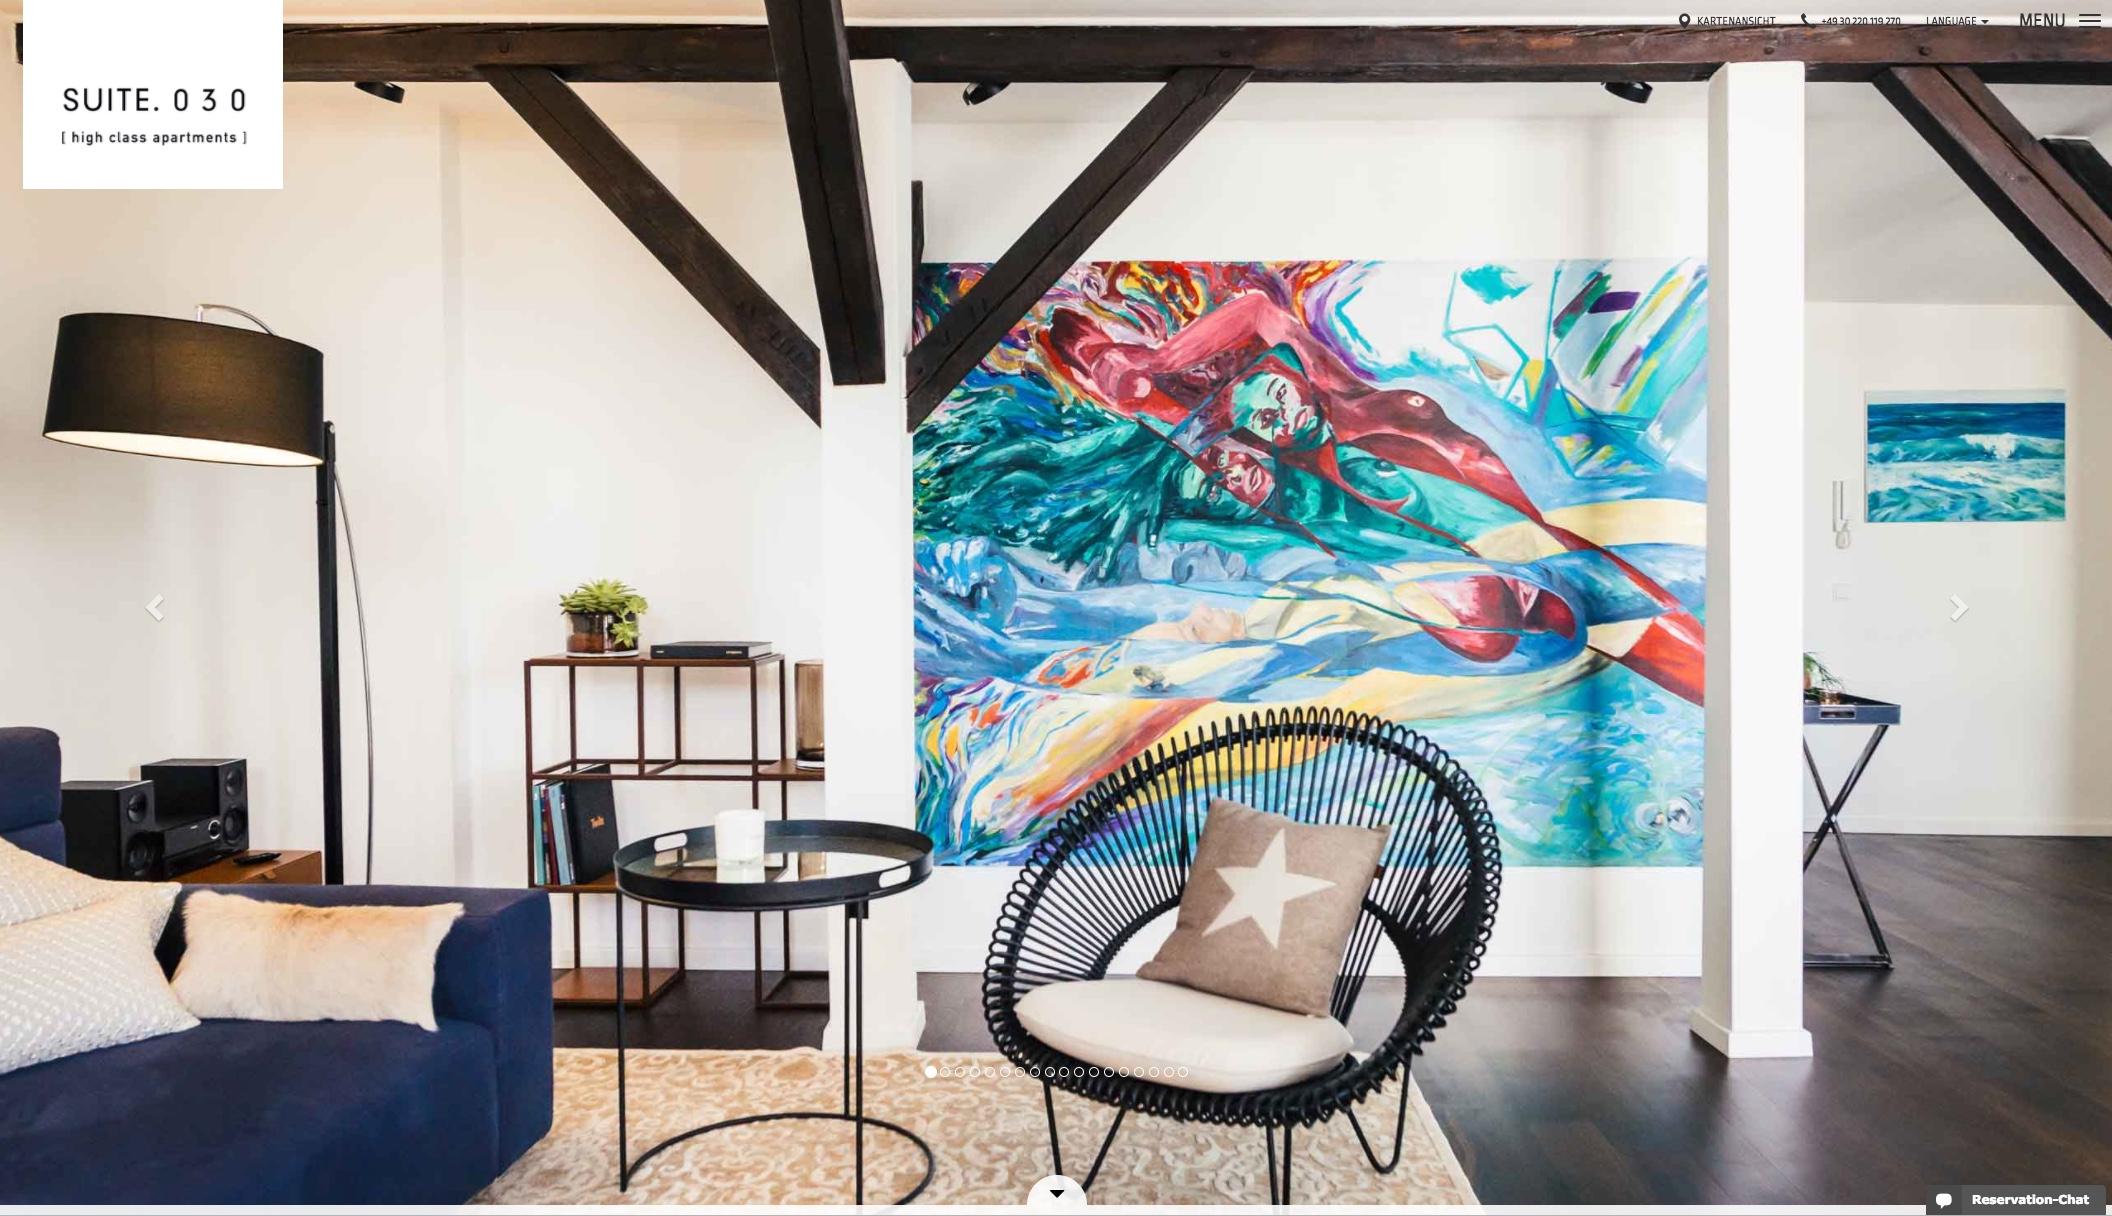 Berliner Dachgeschoss Suite.030 | by andy - for better moods